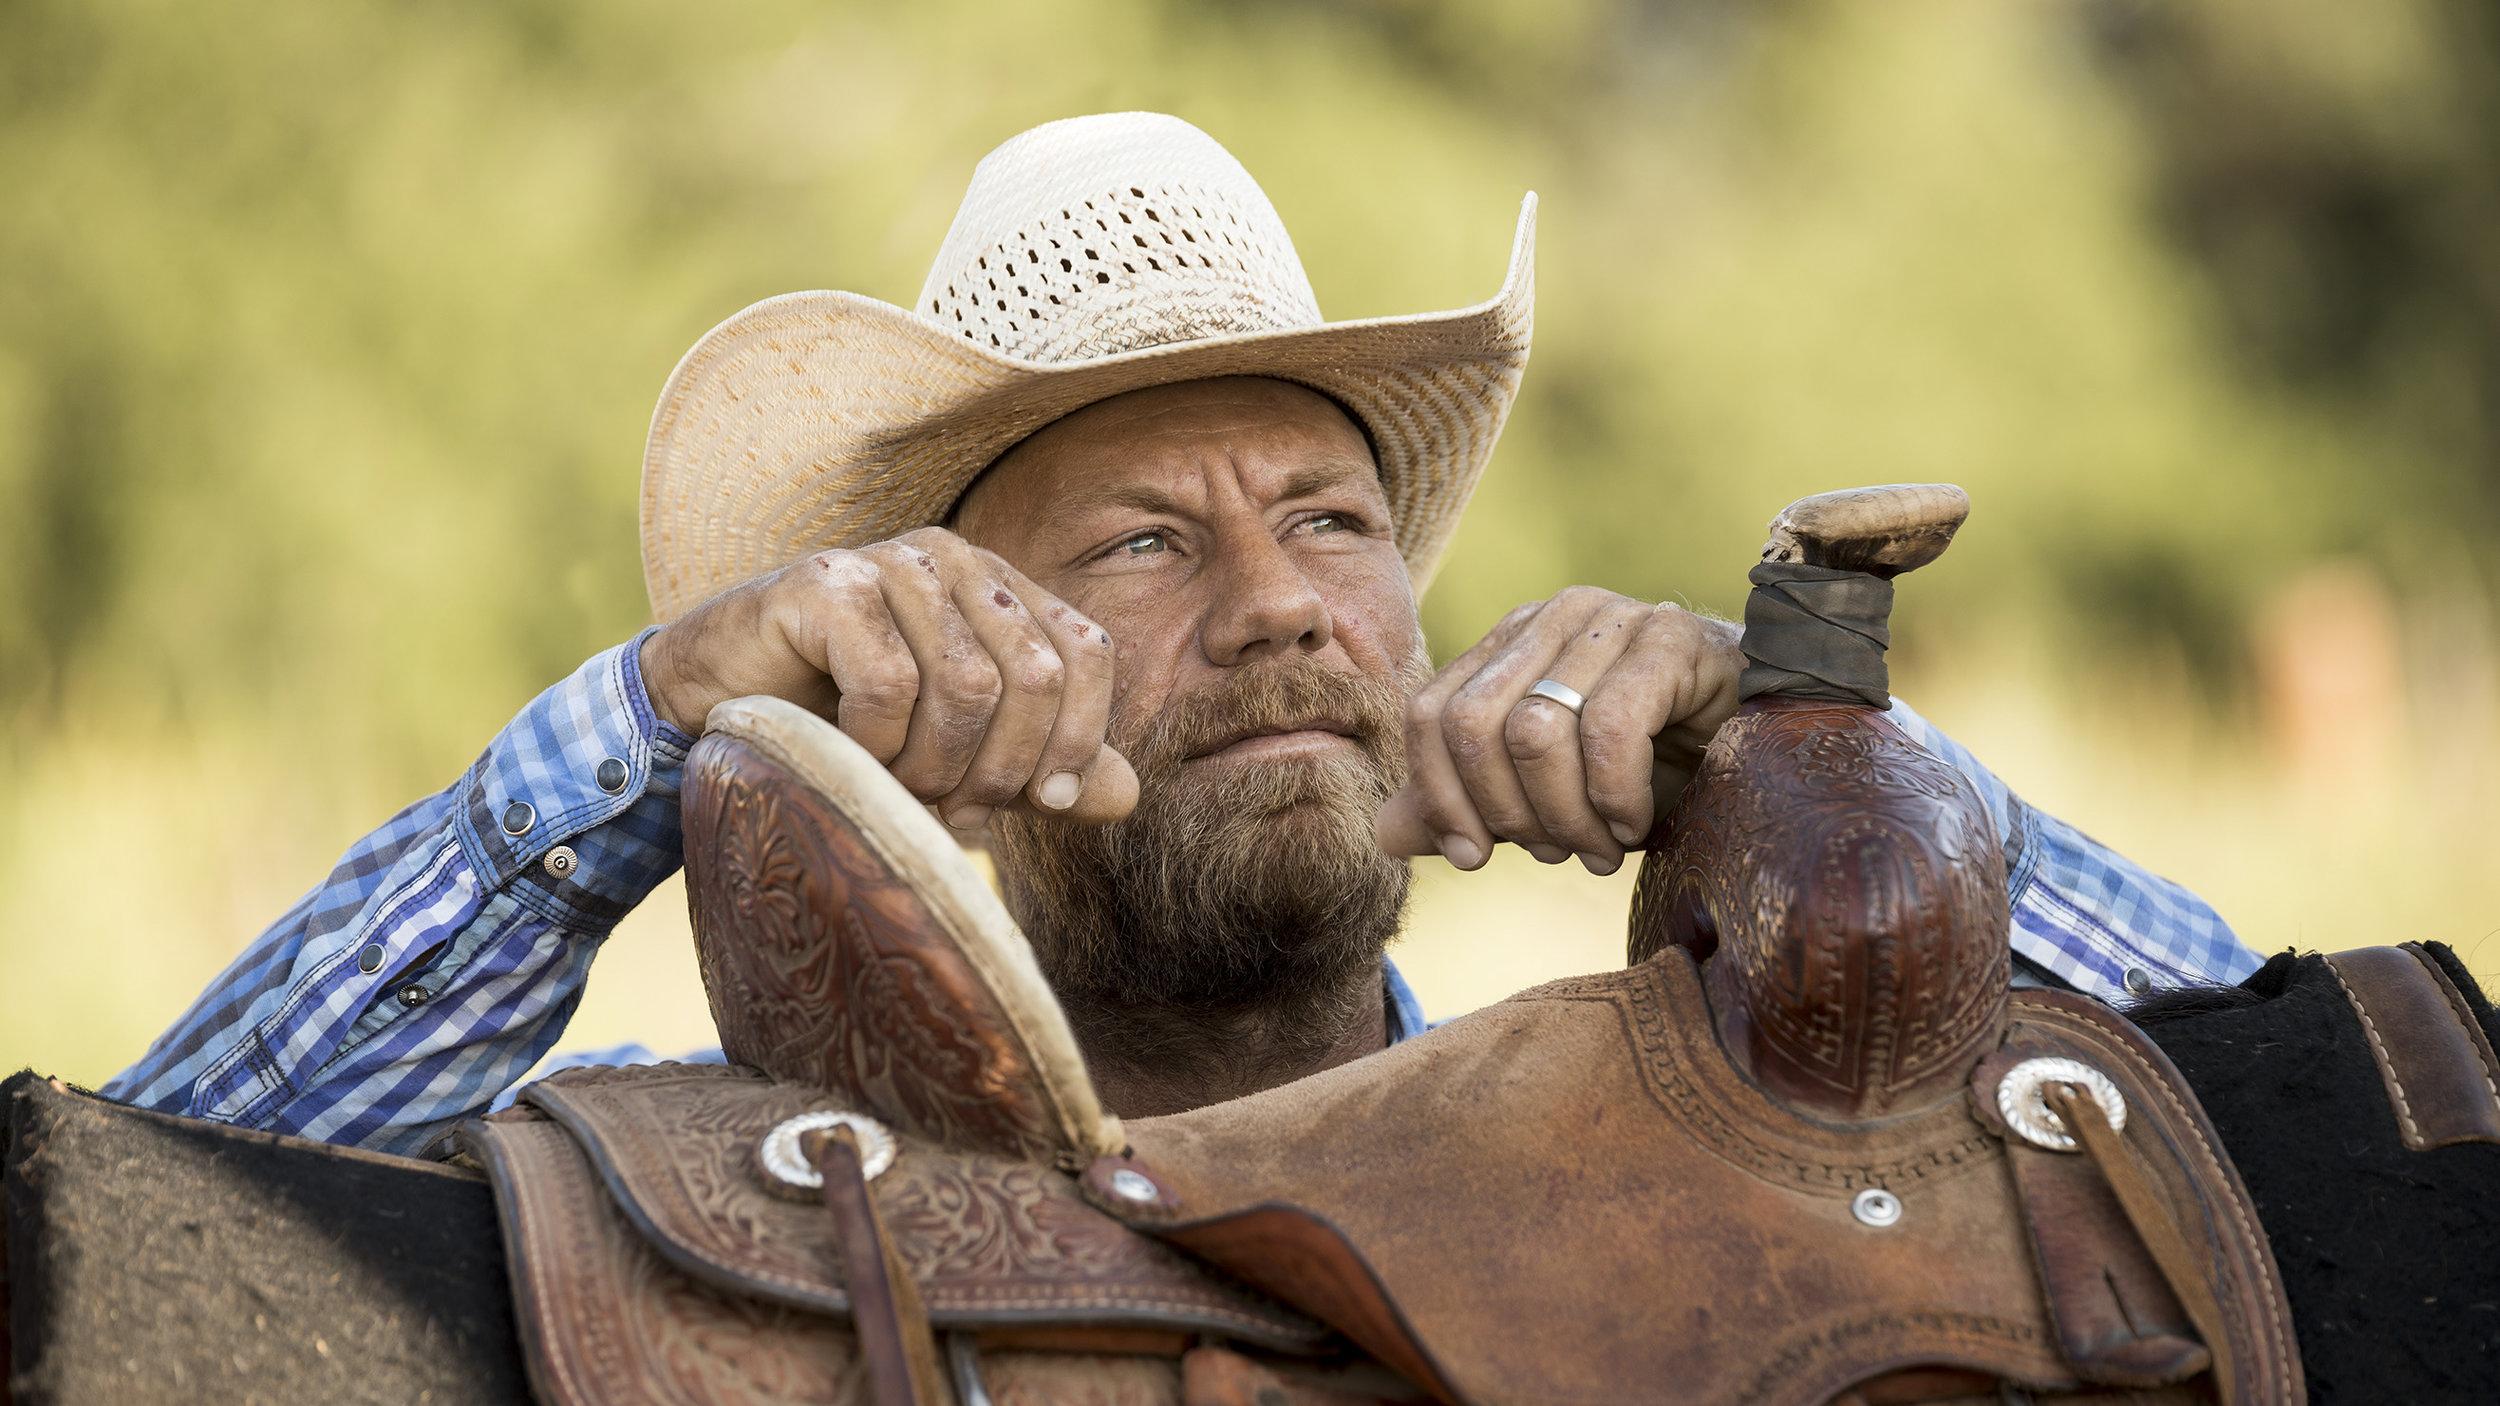 Rode Lewis, Cowboy, Alpine Texas